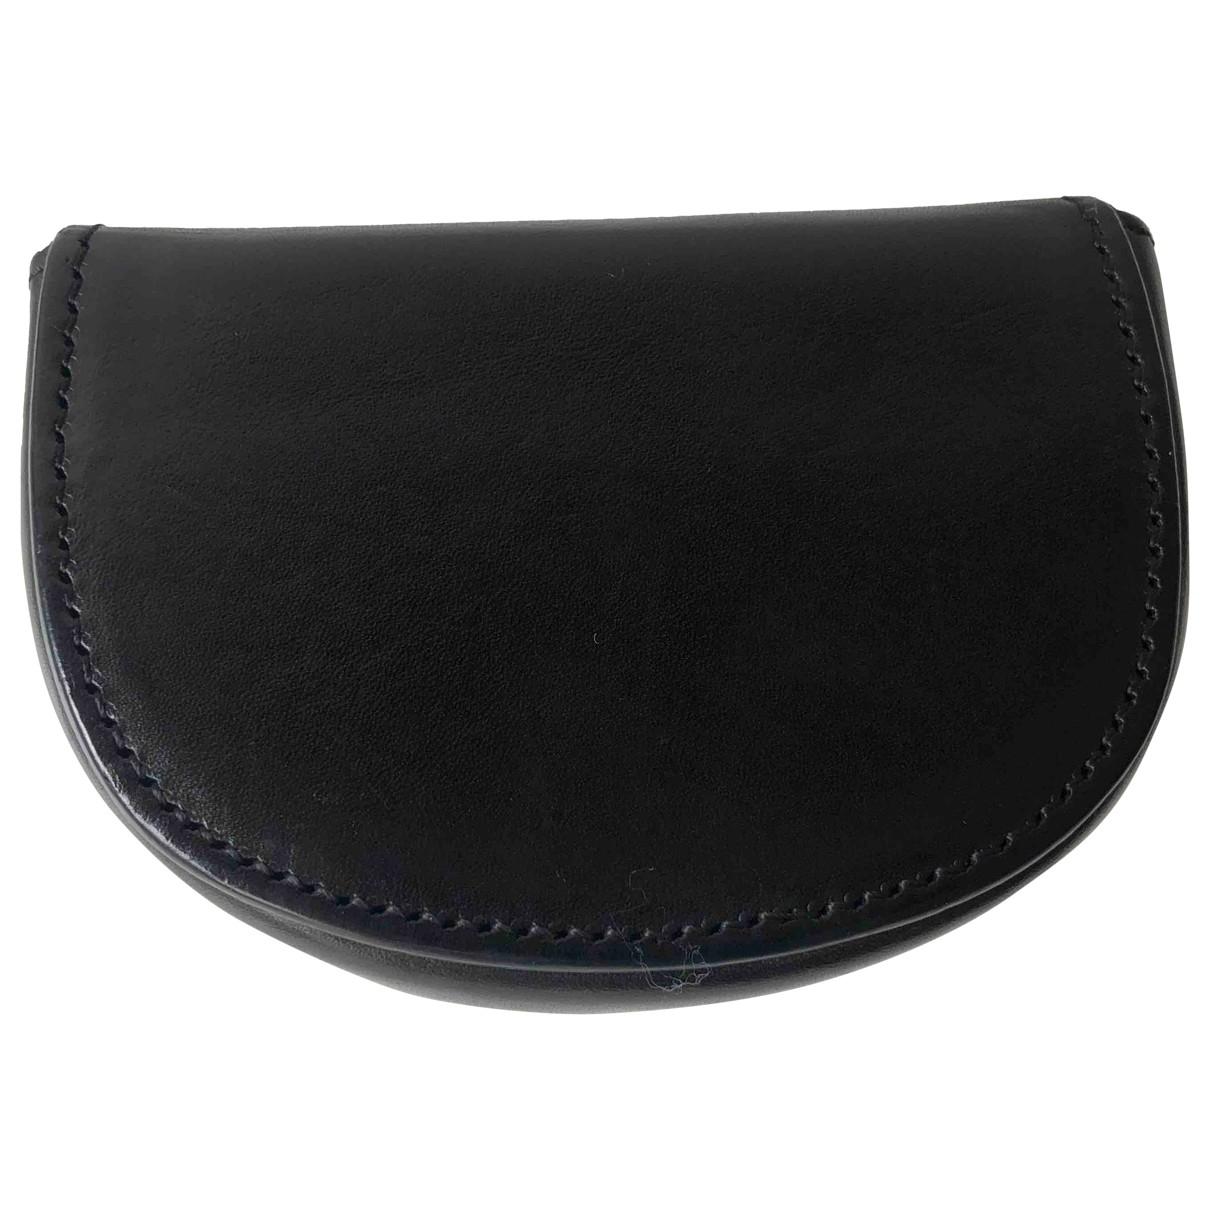 Ann Demeulemeester \N Black Leather Purses, wallet & cases for Women \N